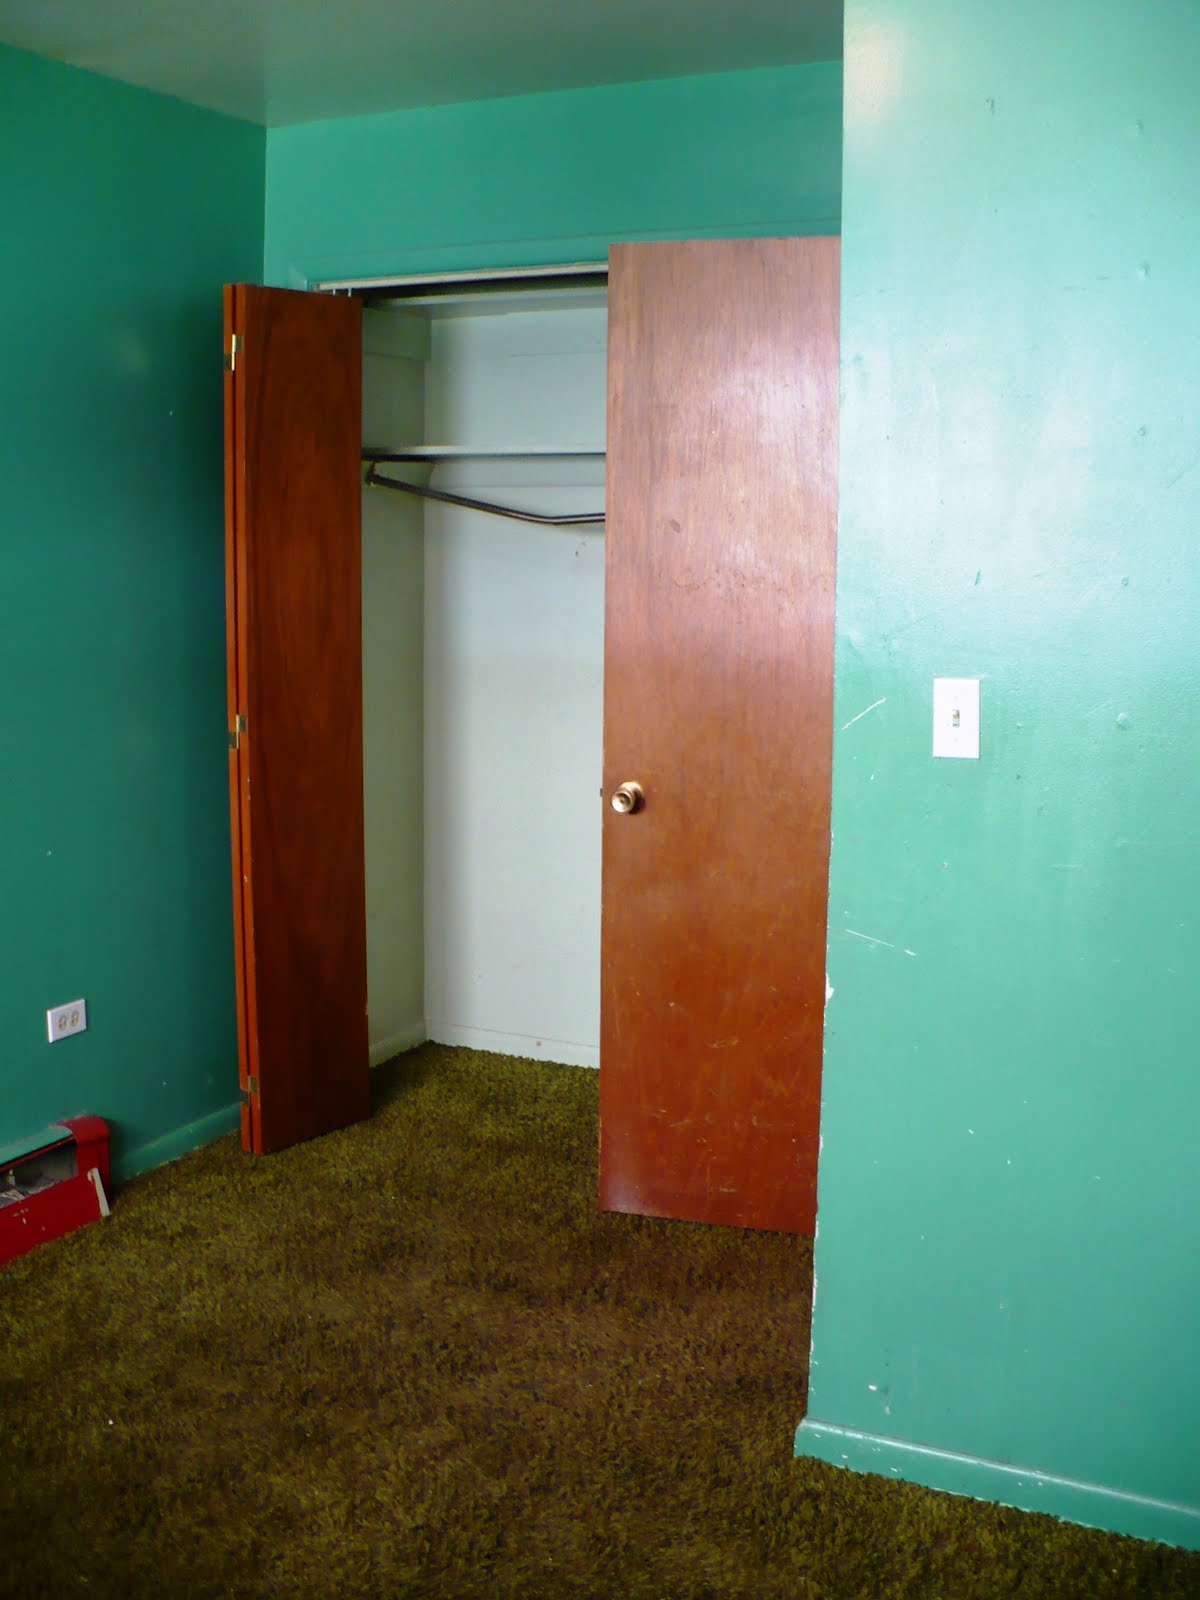 The Pee Room Needs A New Name